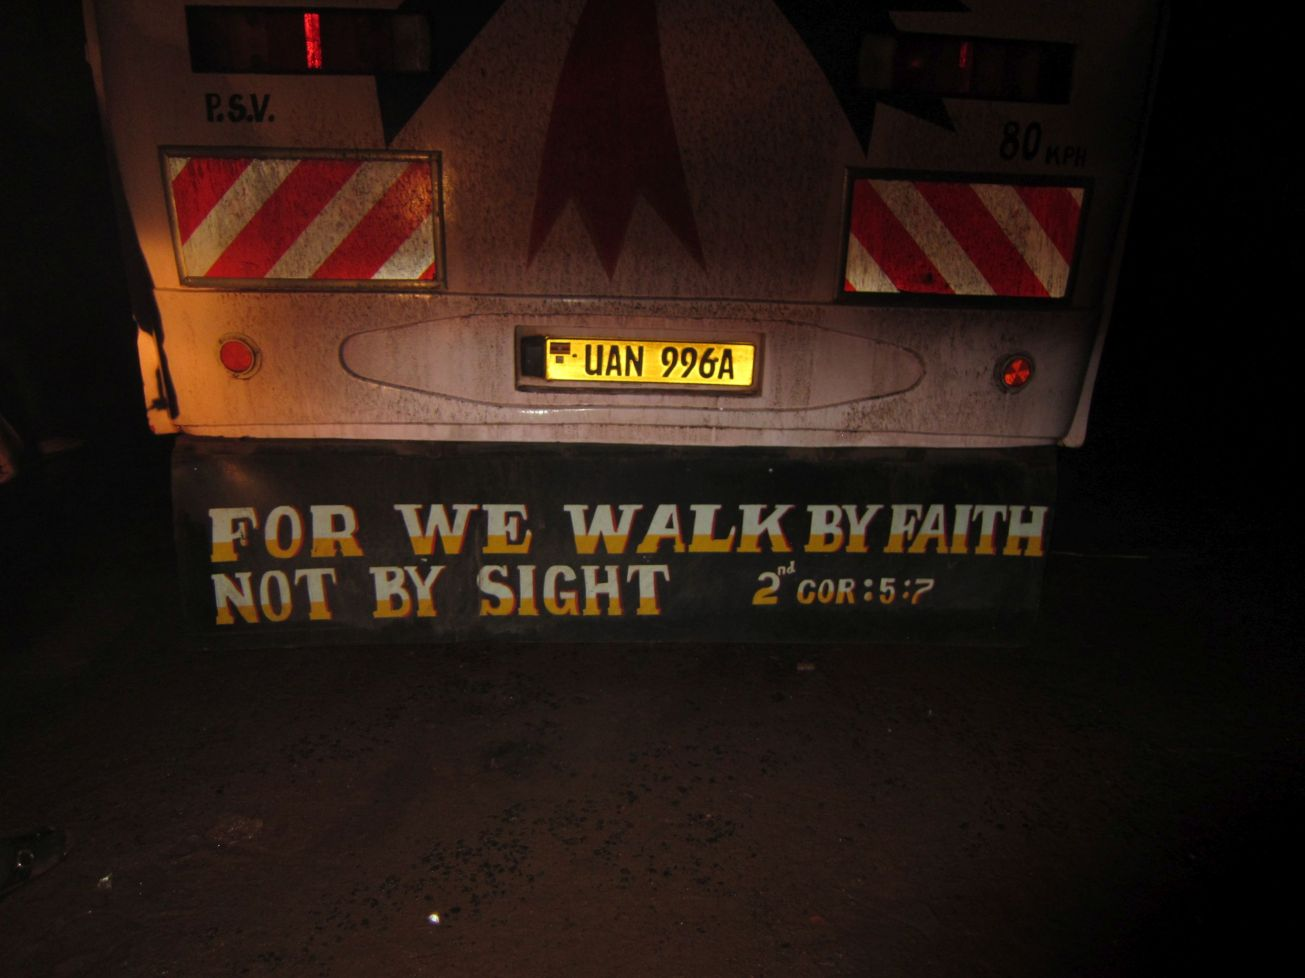 Jesus, Christ, Uganda, Gabon, God, religion, sticker, driving, roads, faith, sight